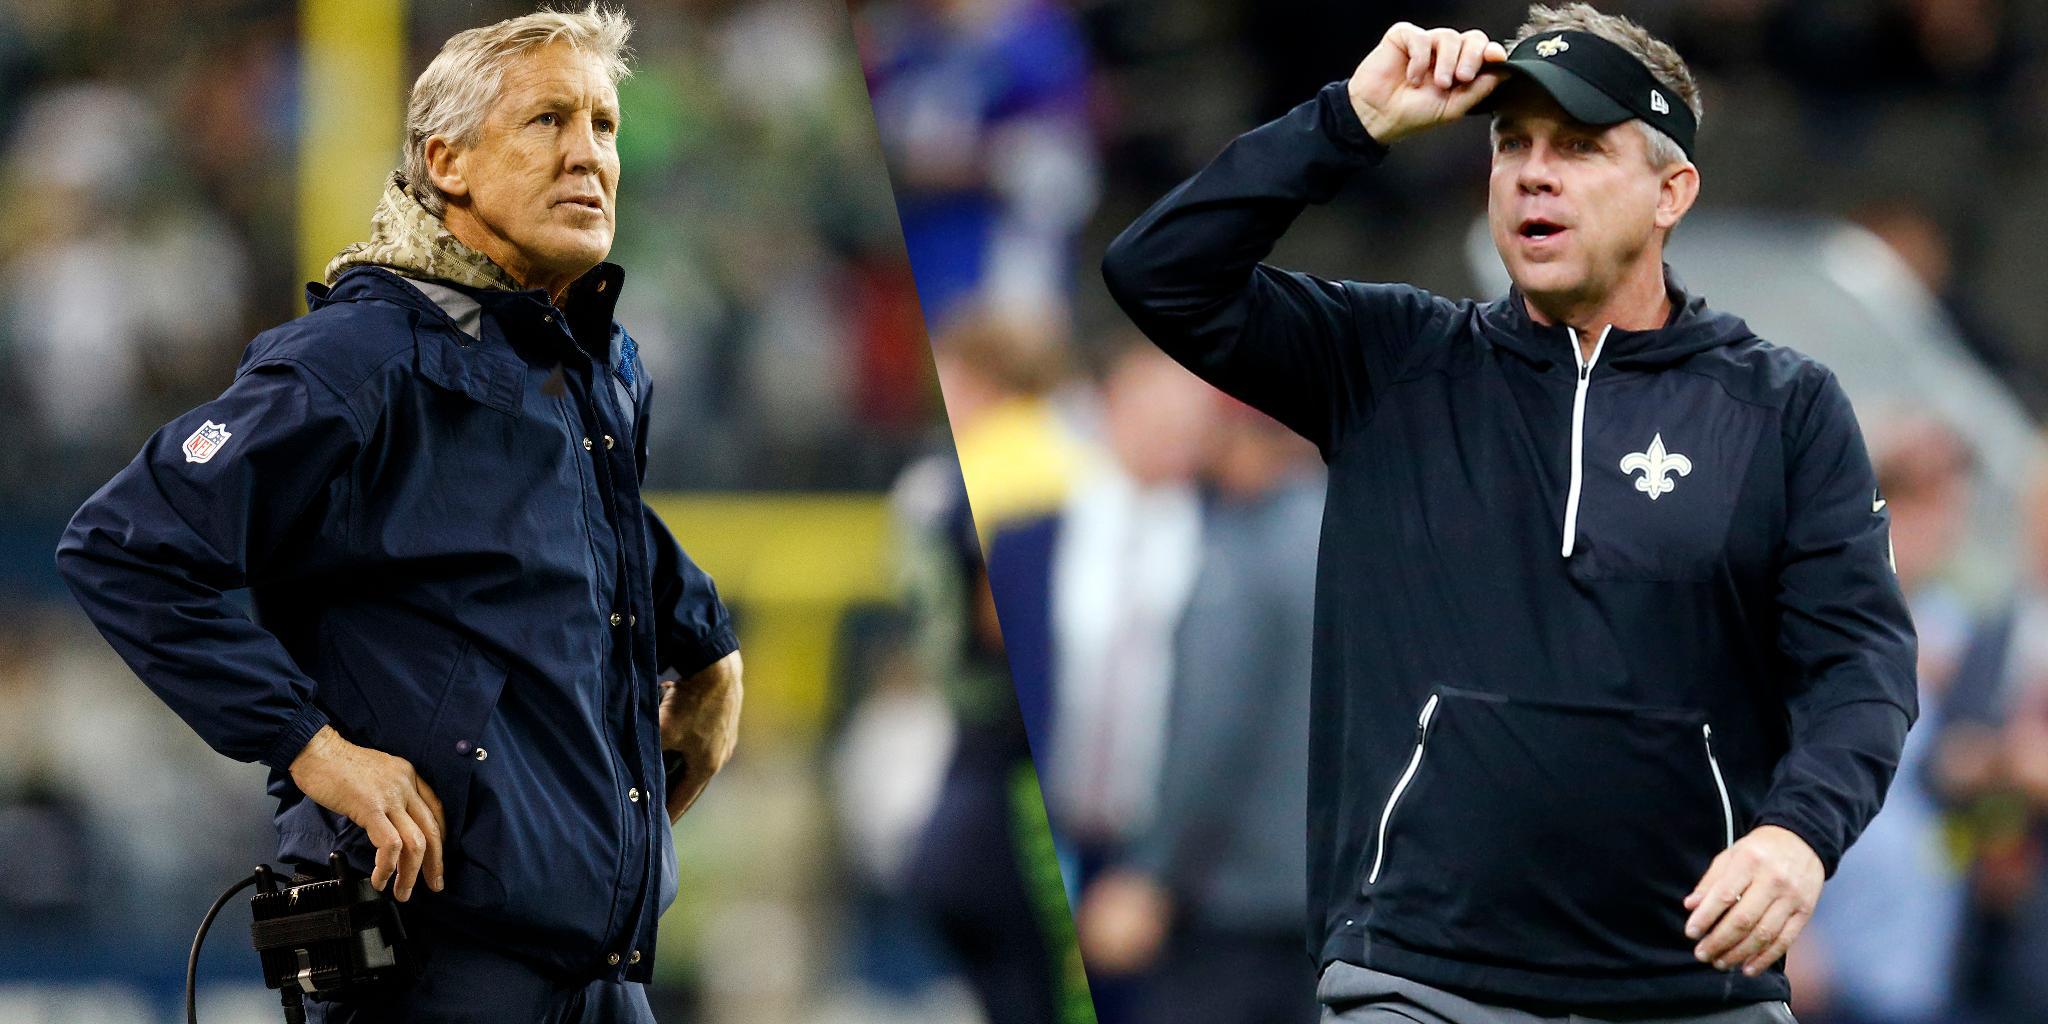 Sean Payton, Pete Carroll among coaches fined: https://t.co/E3IY3pqrd6 (via @TomPelissero) https://t.co/VgYVV2GLoV